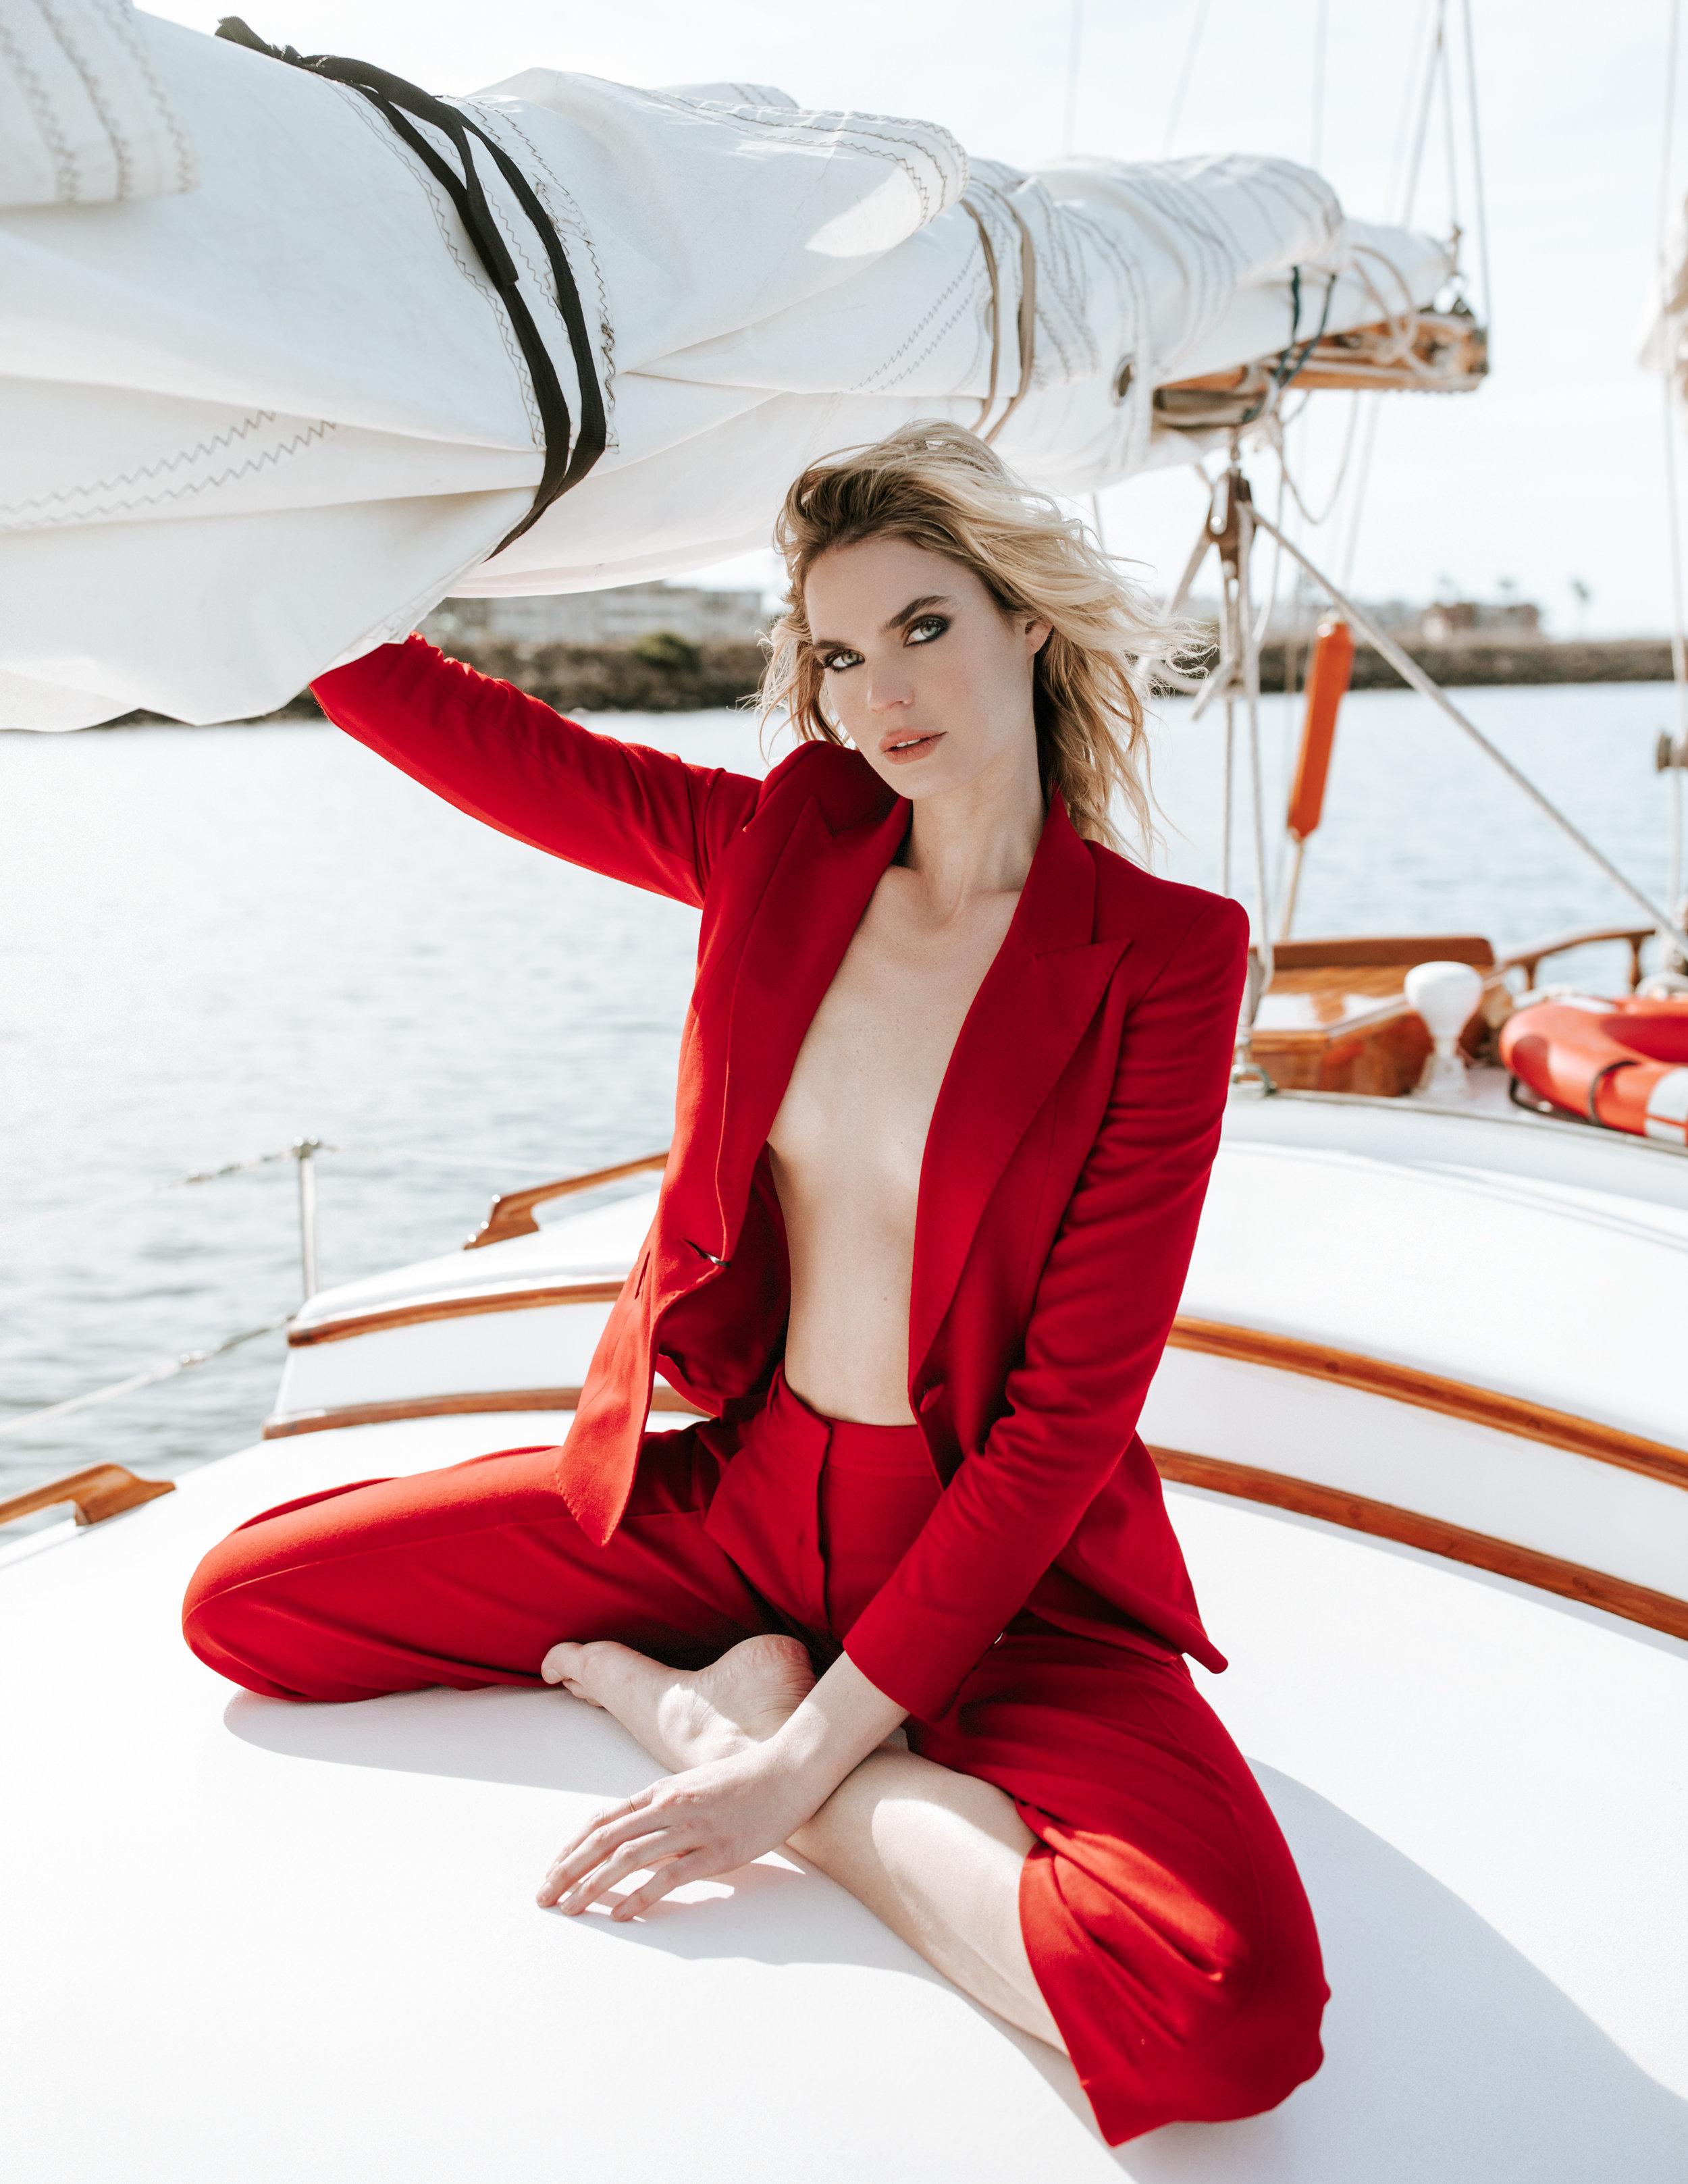 Sailing Editorials (35 of 36).jpg